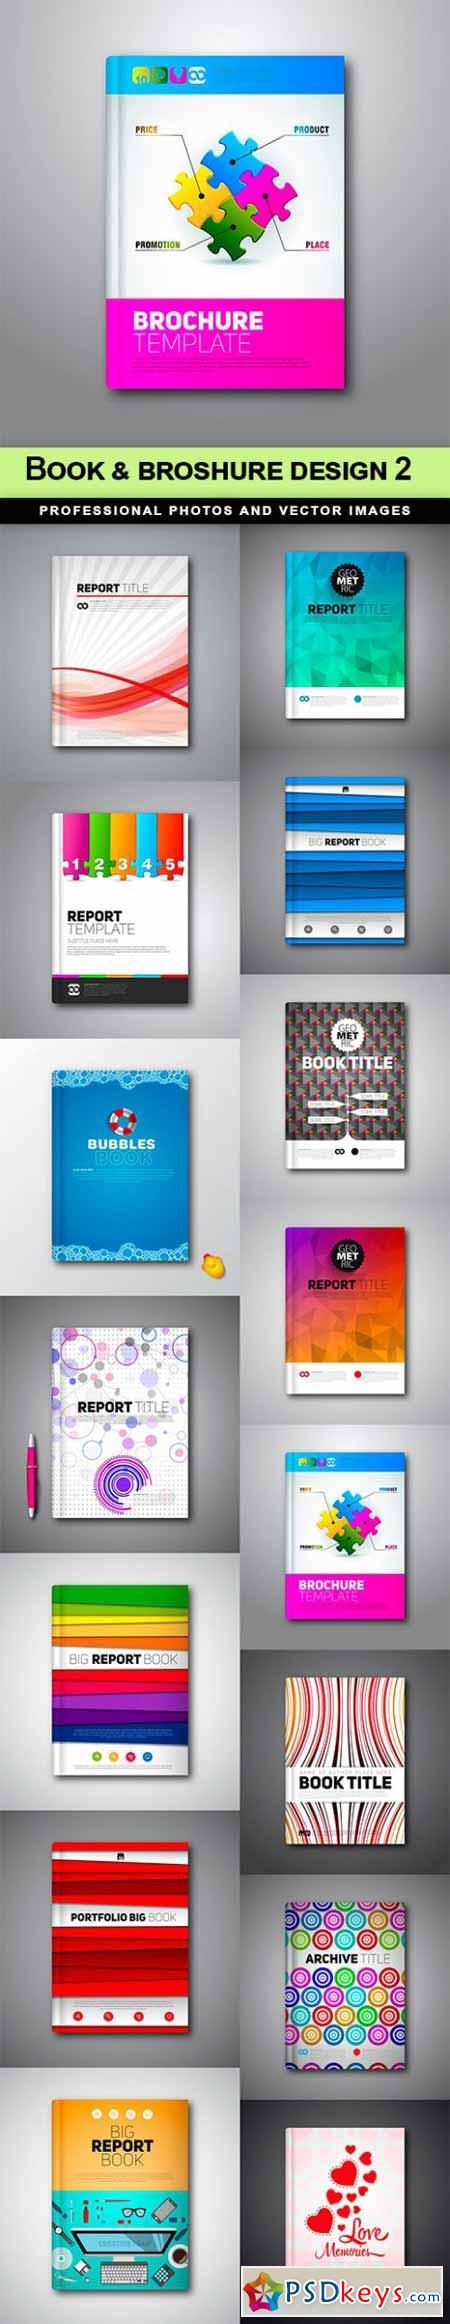 Book & broshure design 2 - 15 EPS